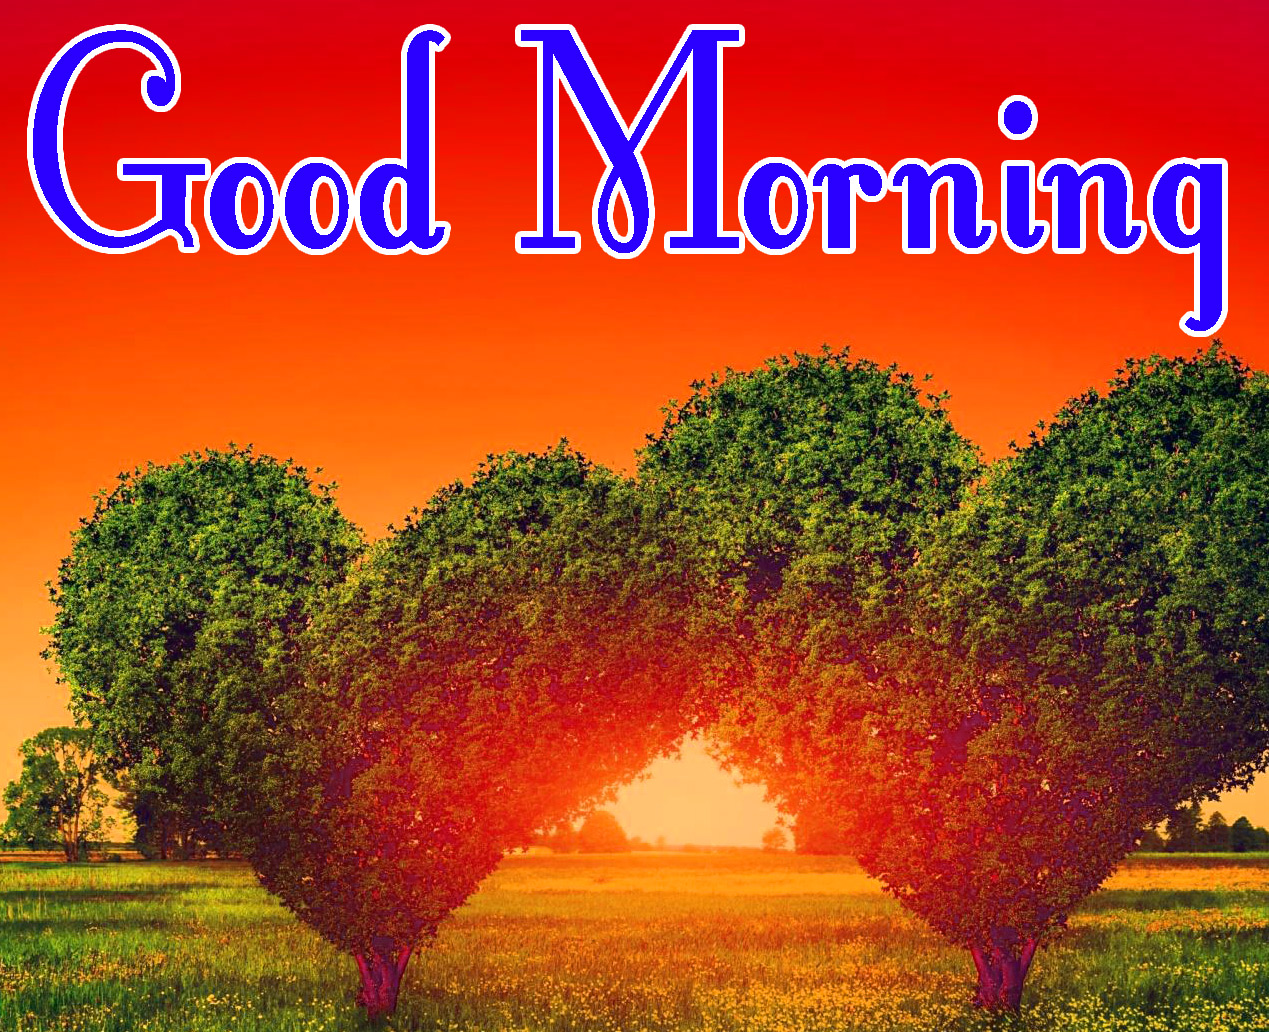 216 Nature Good Morning Images Pics Download 2020 Good Morning Images Good Morning Photo Hd Downlaod Good Morning Pics Wallpaper Hd